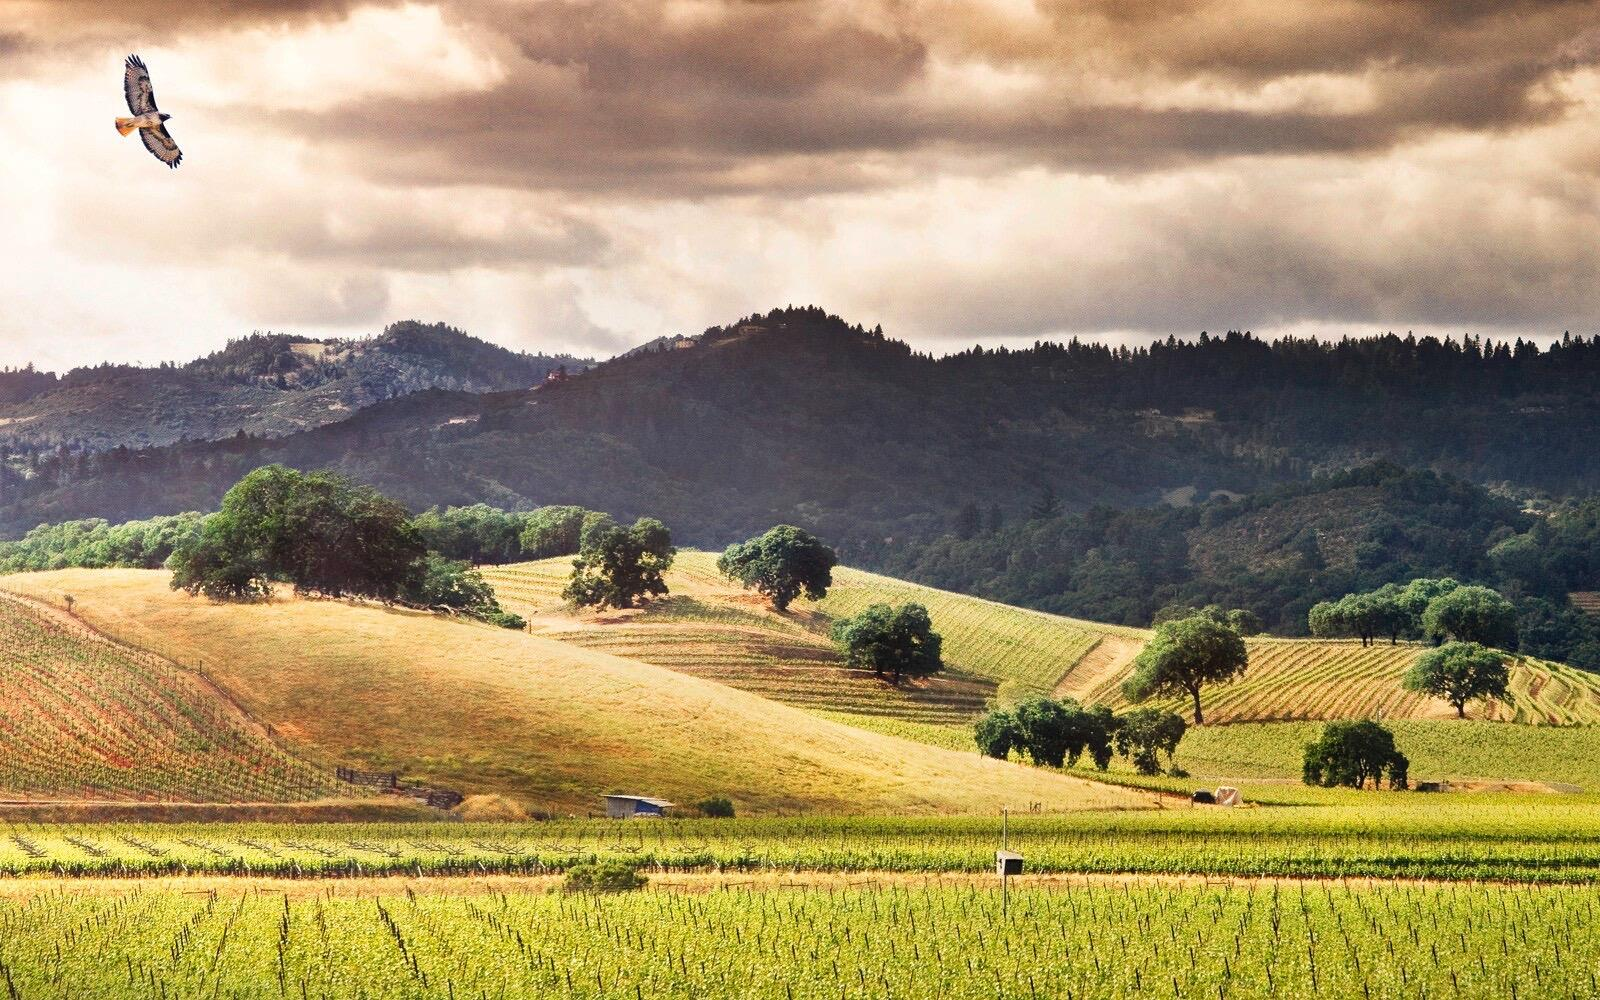 Honig Vineyard & Winery Cover Image